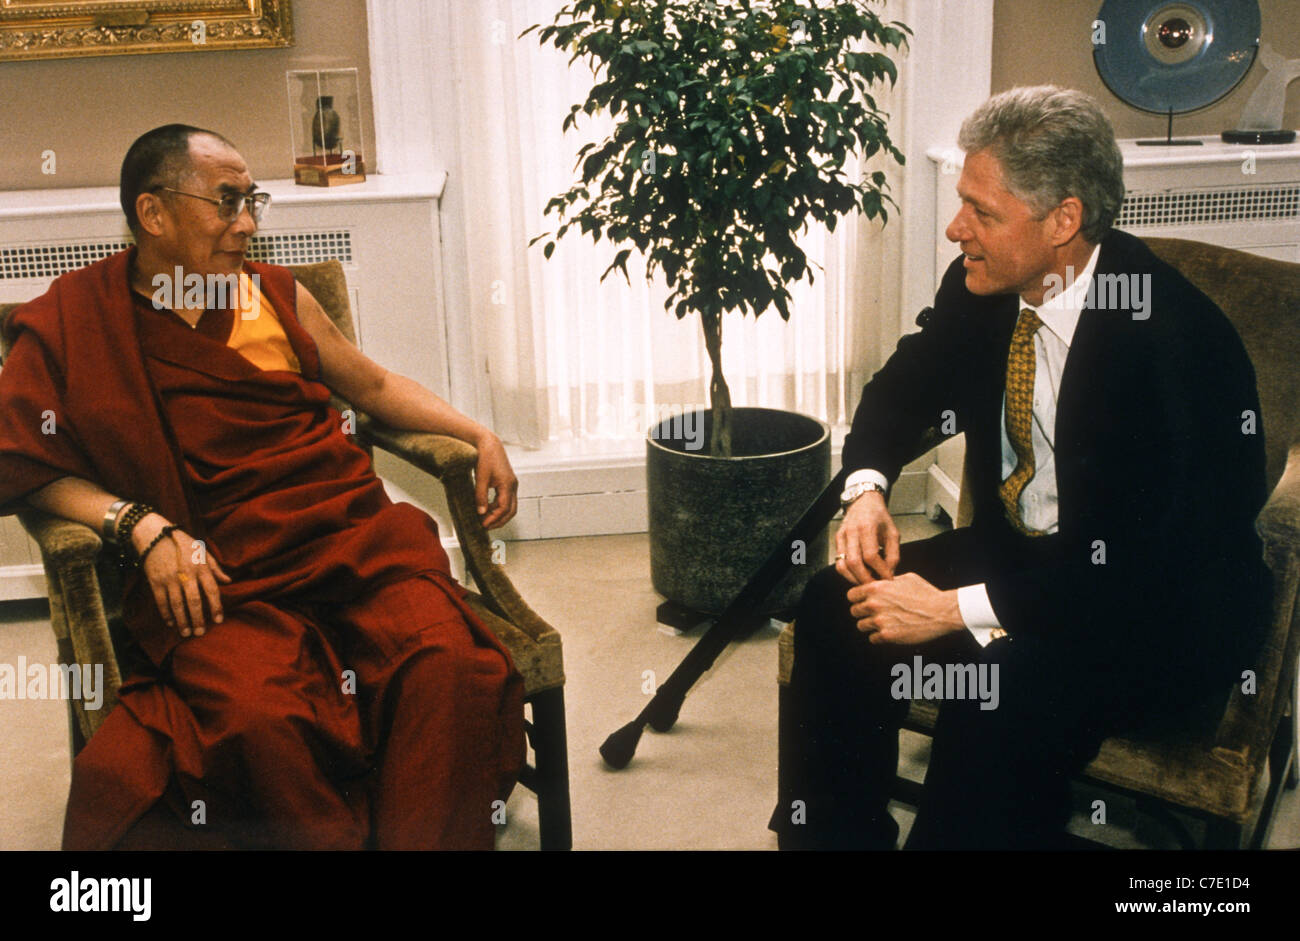 US President Bill Clinton with Tibetan spiritual leader the Dalai Lama in the White House April 24, 1997 In Washington, - Stock Image